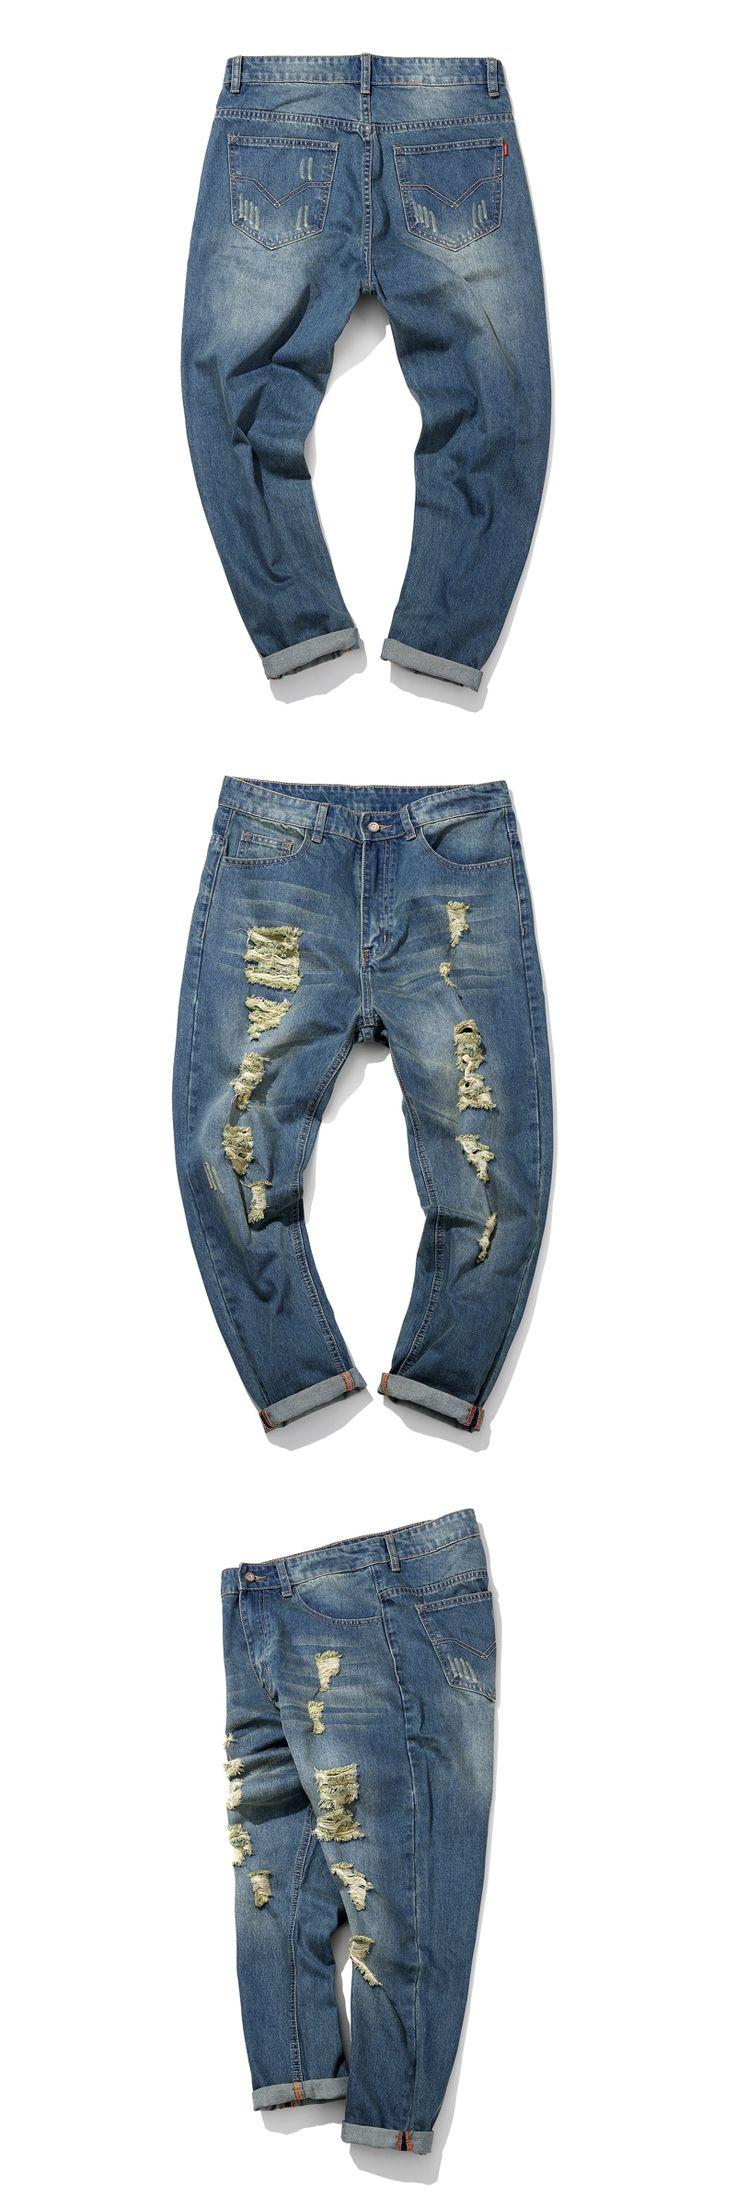 2016 Men Jeans Straight tube nostalgia hole Designer Jeans Mens  Harem Jeans Men Skinny Jeans Homme